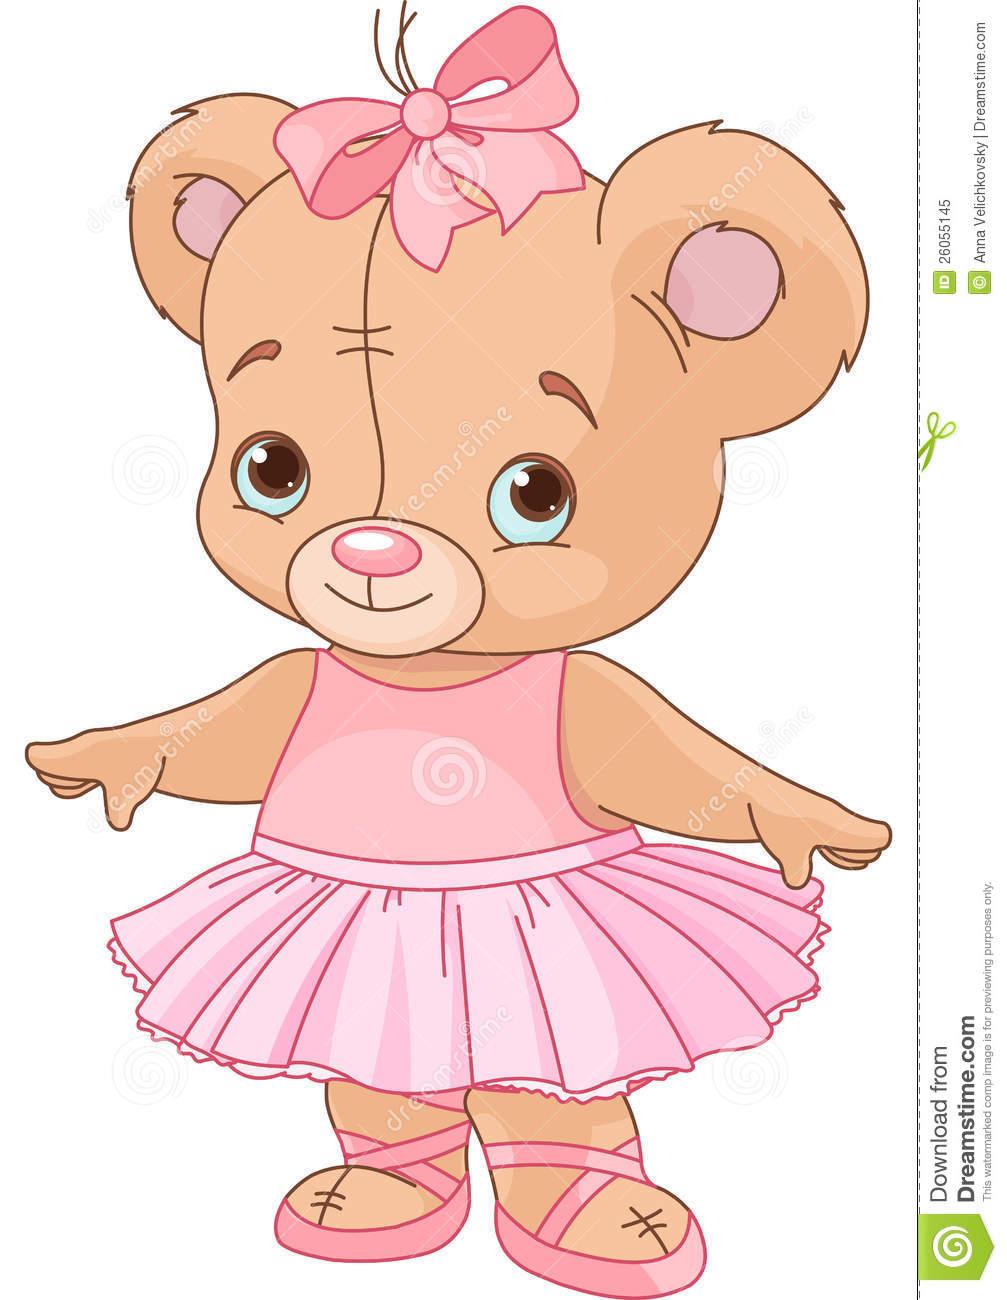 Teddy clipart cute Cute Cute art teddy Tatty